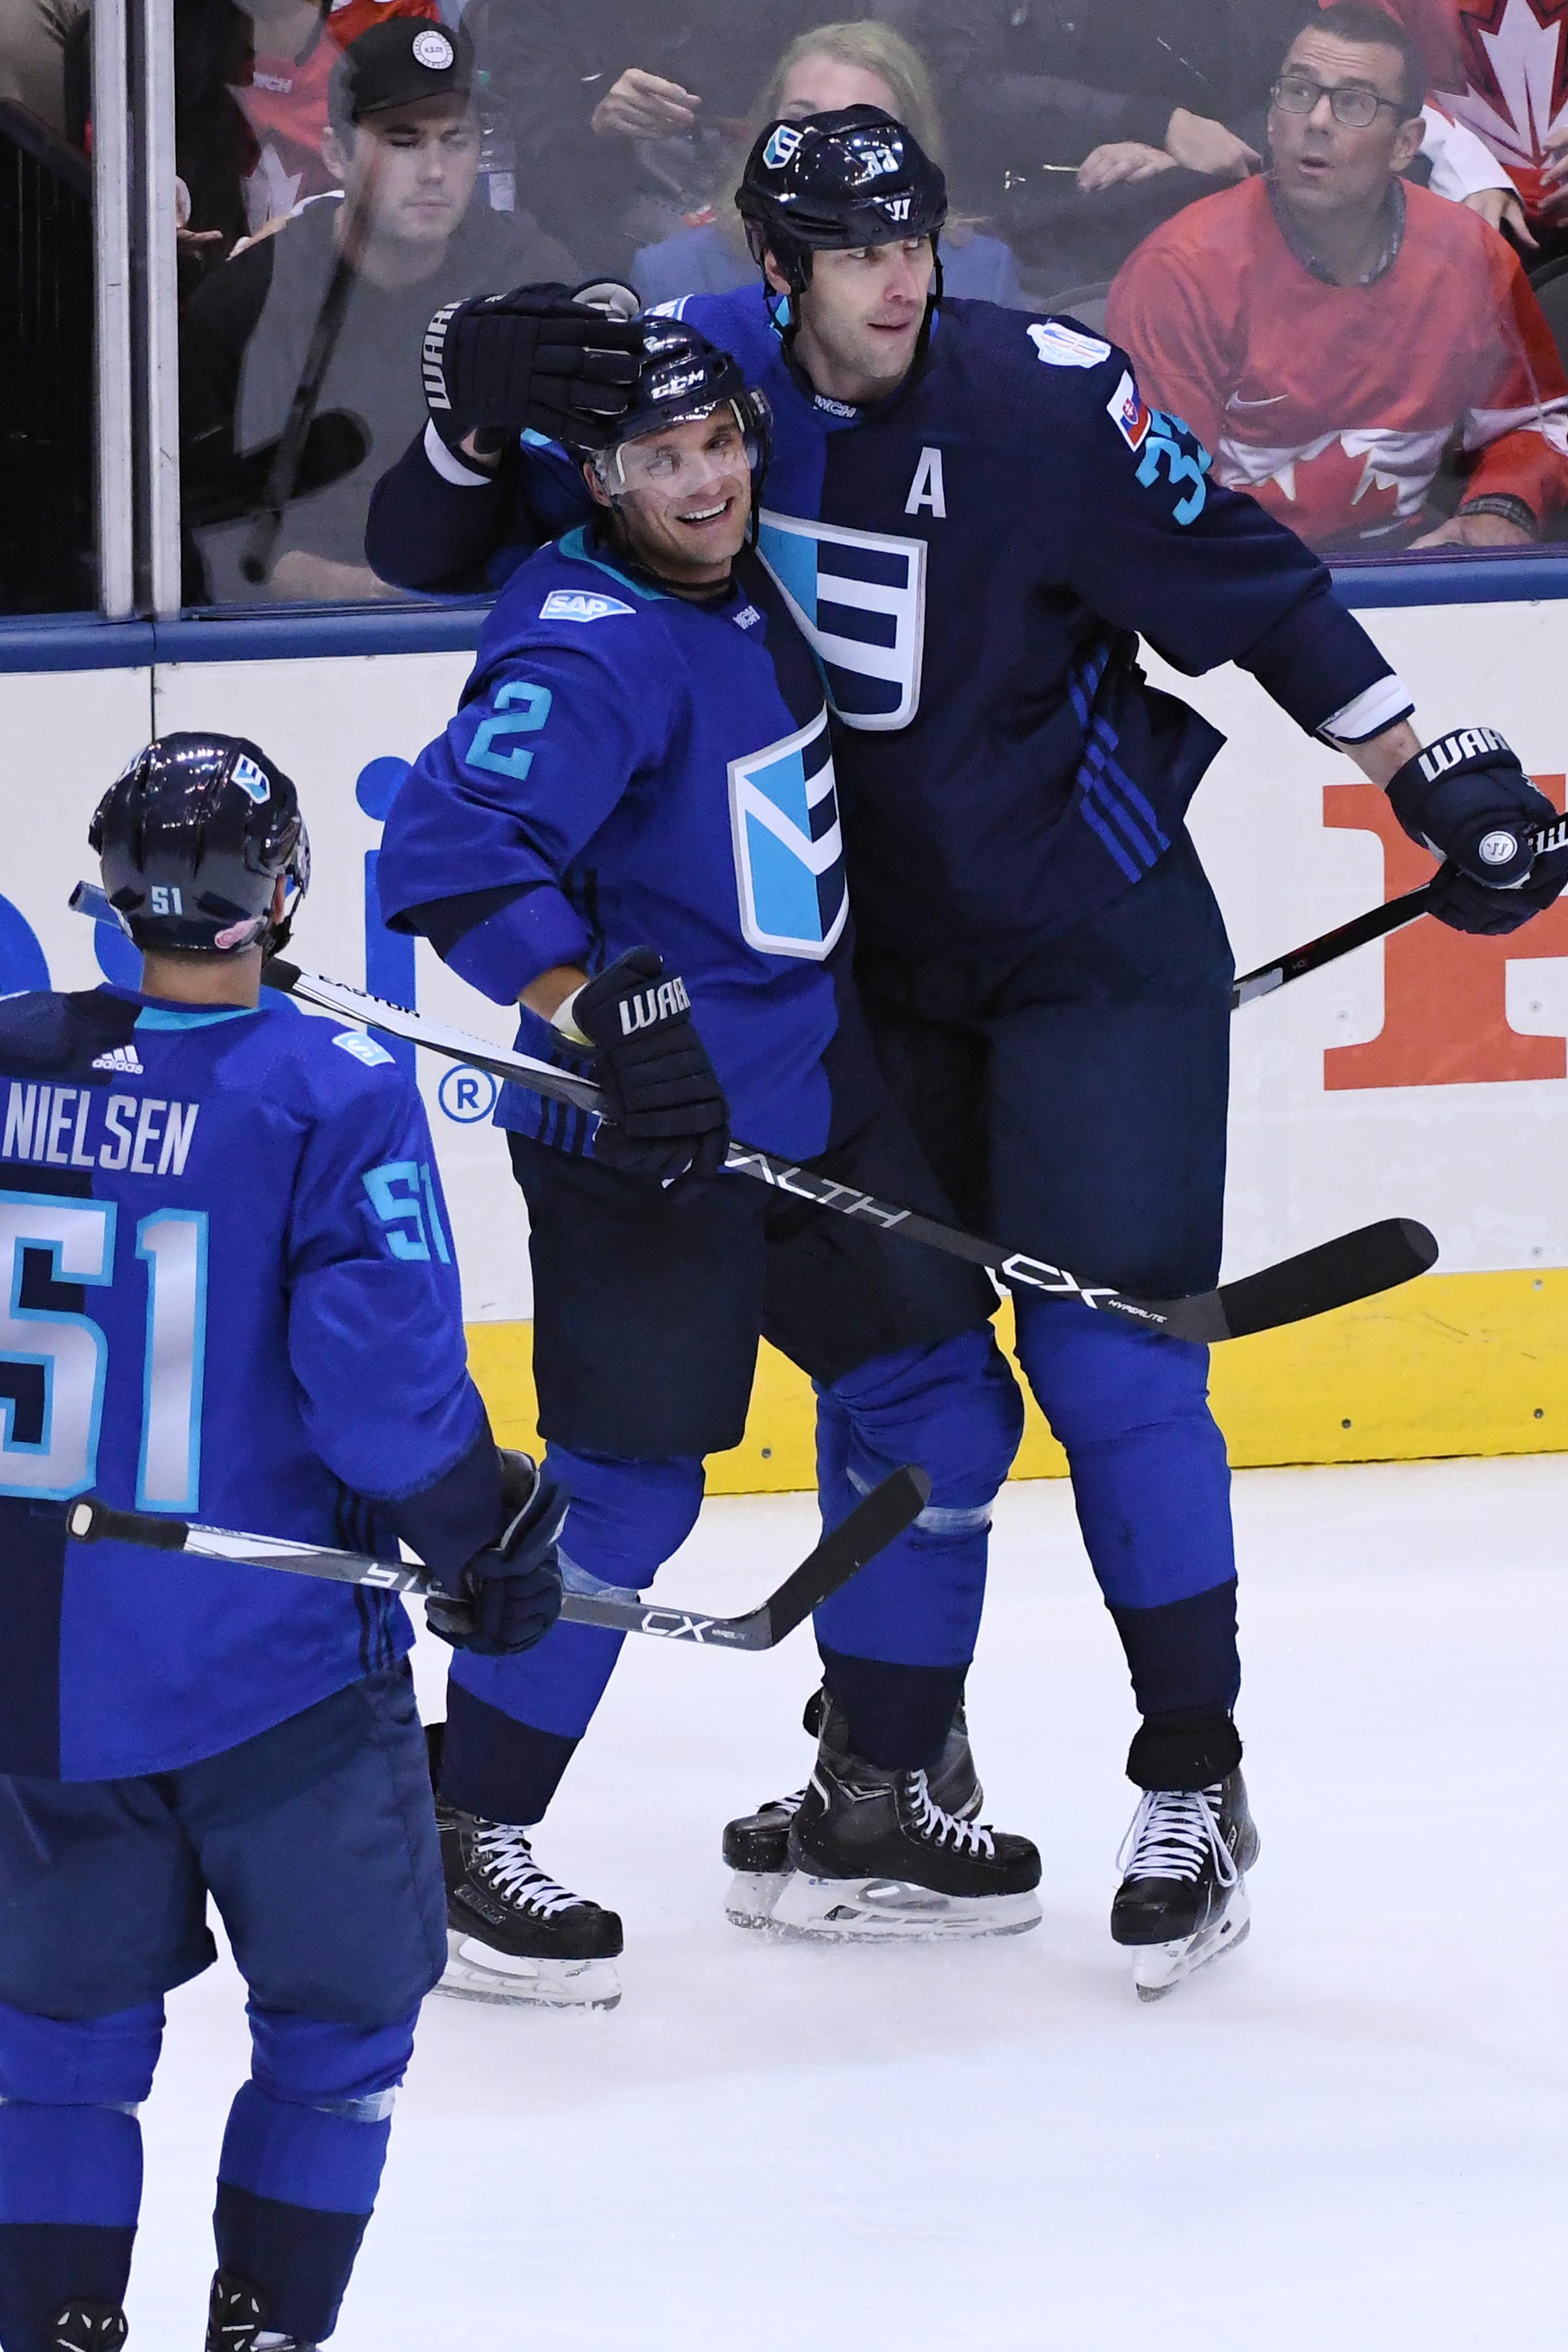 HOCKEY: SEP 29 World Cup of Hockey - Final - Game 2 - Team Europe v Team Canada